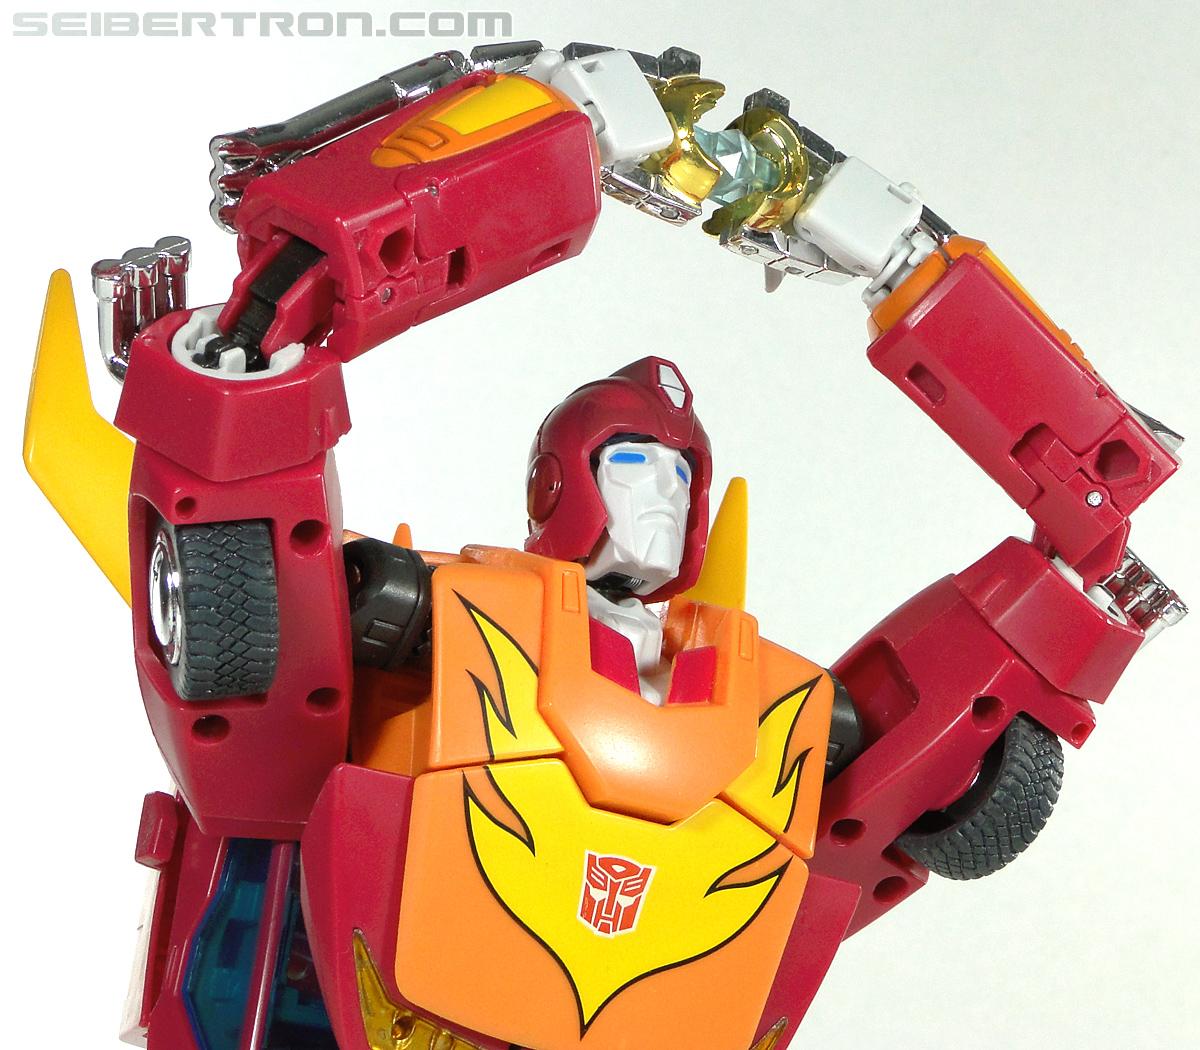 Transformers Masterpiece Rodimus Prime (MP-09) (Rodimus Convoy (MP-09)) (Image #515 of 515)